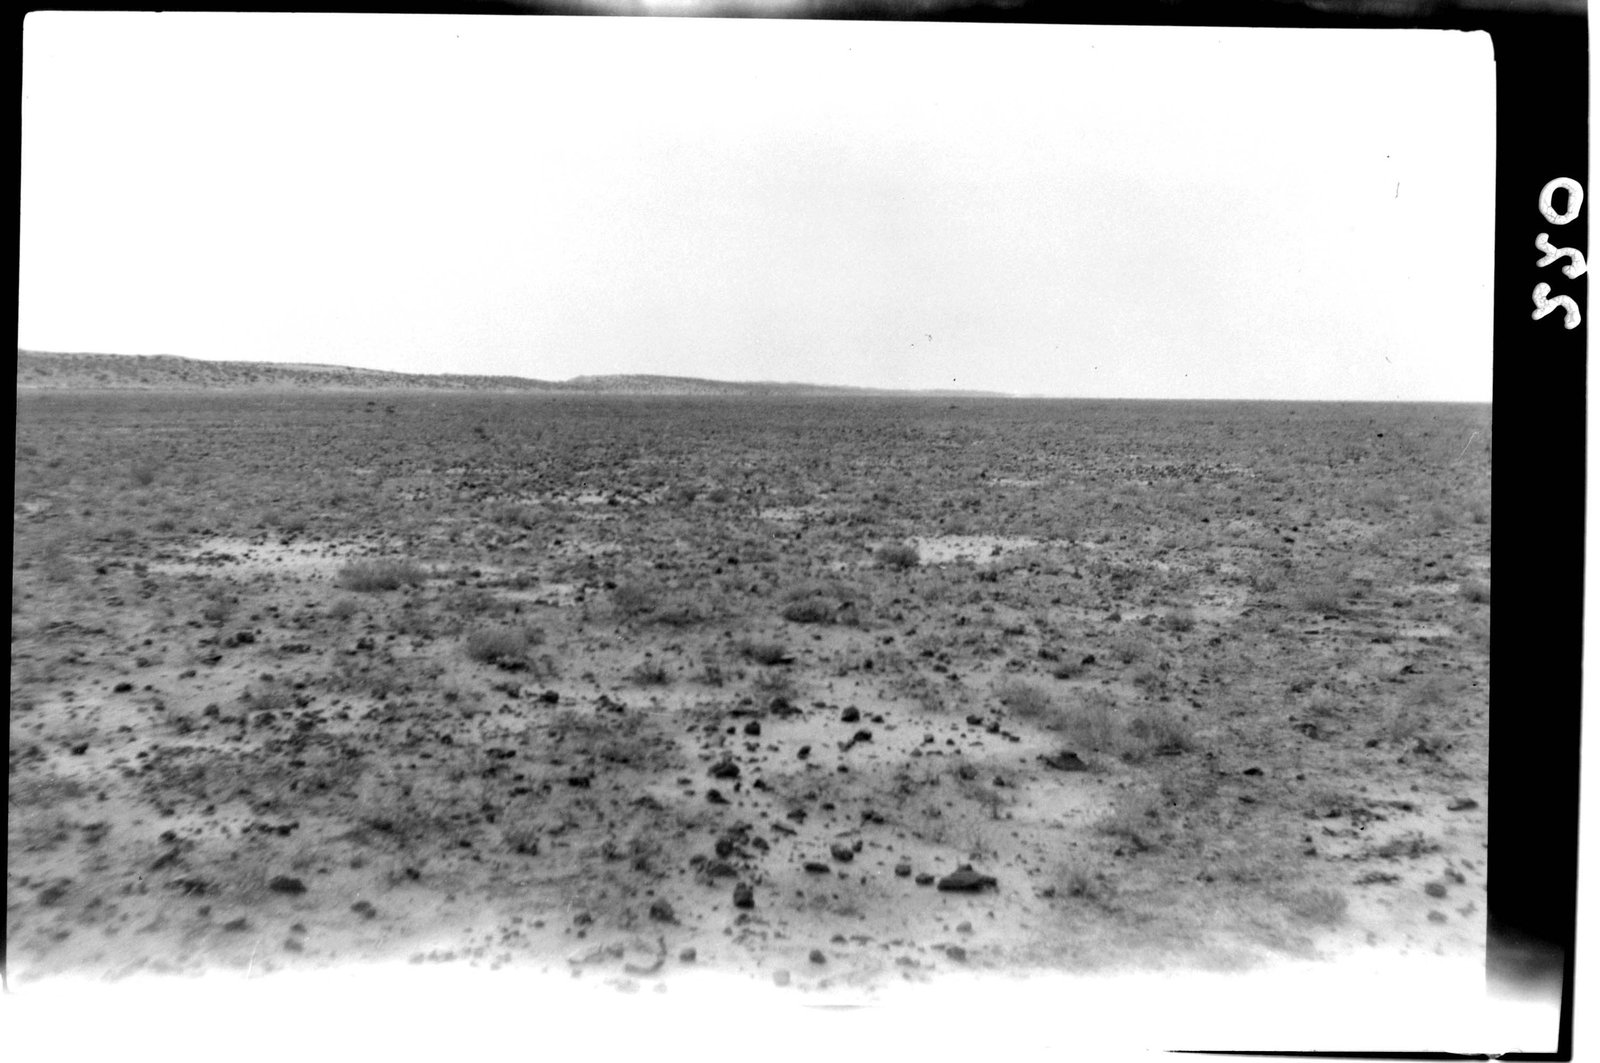 Desert Rat Kangaroo habitat circa 1931